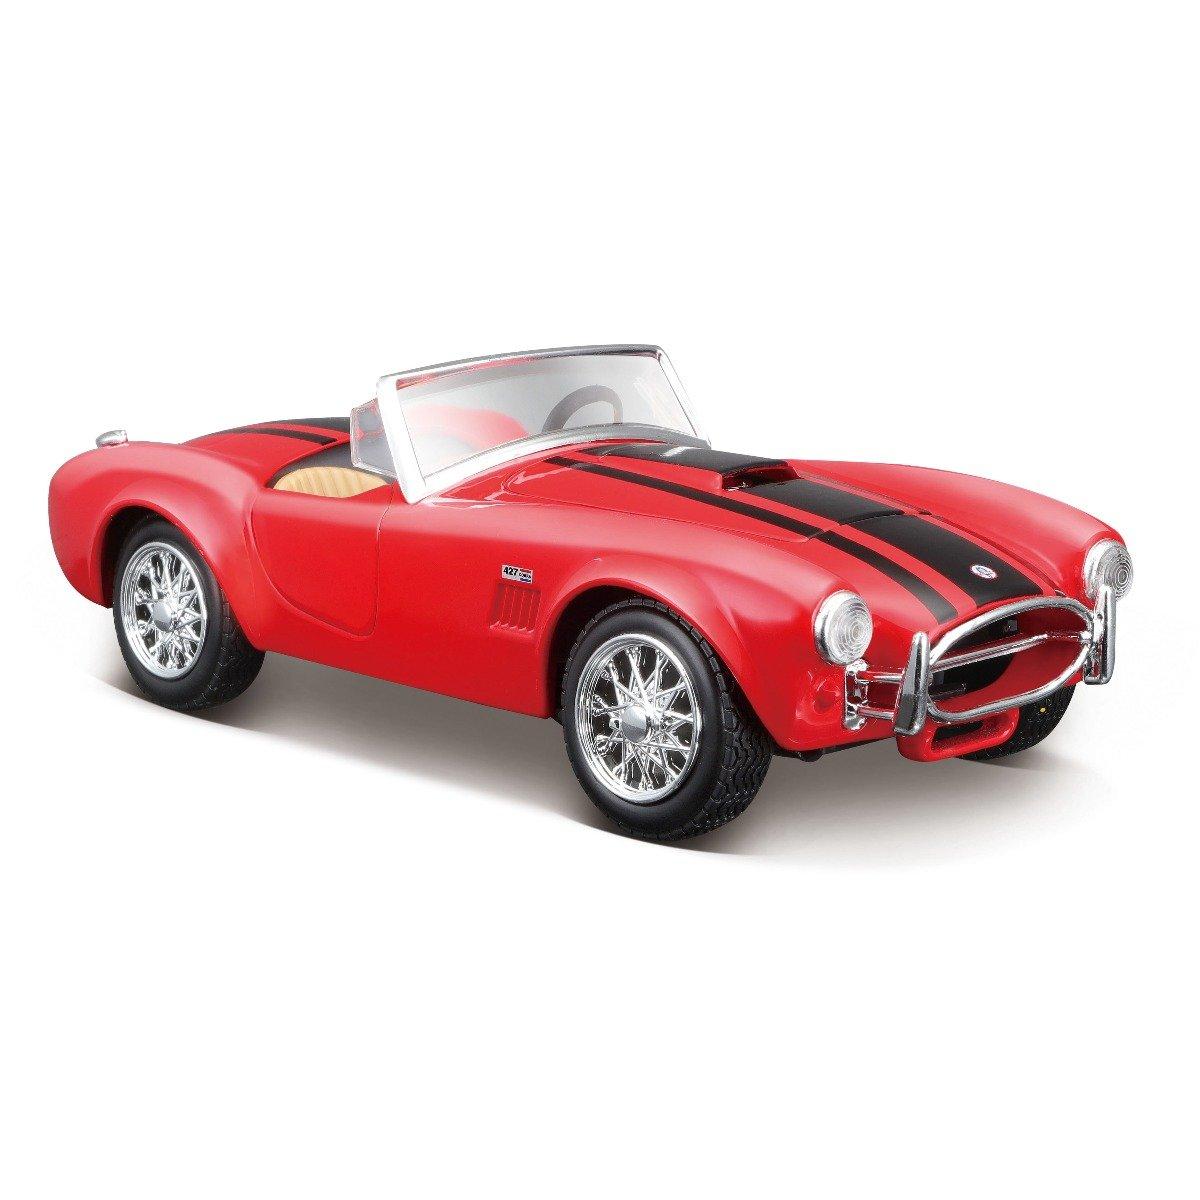 Masinuta Maisto Shelby Cobra 427, 1:24, Rosu